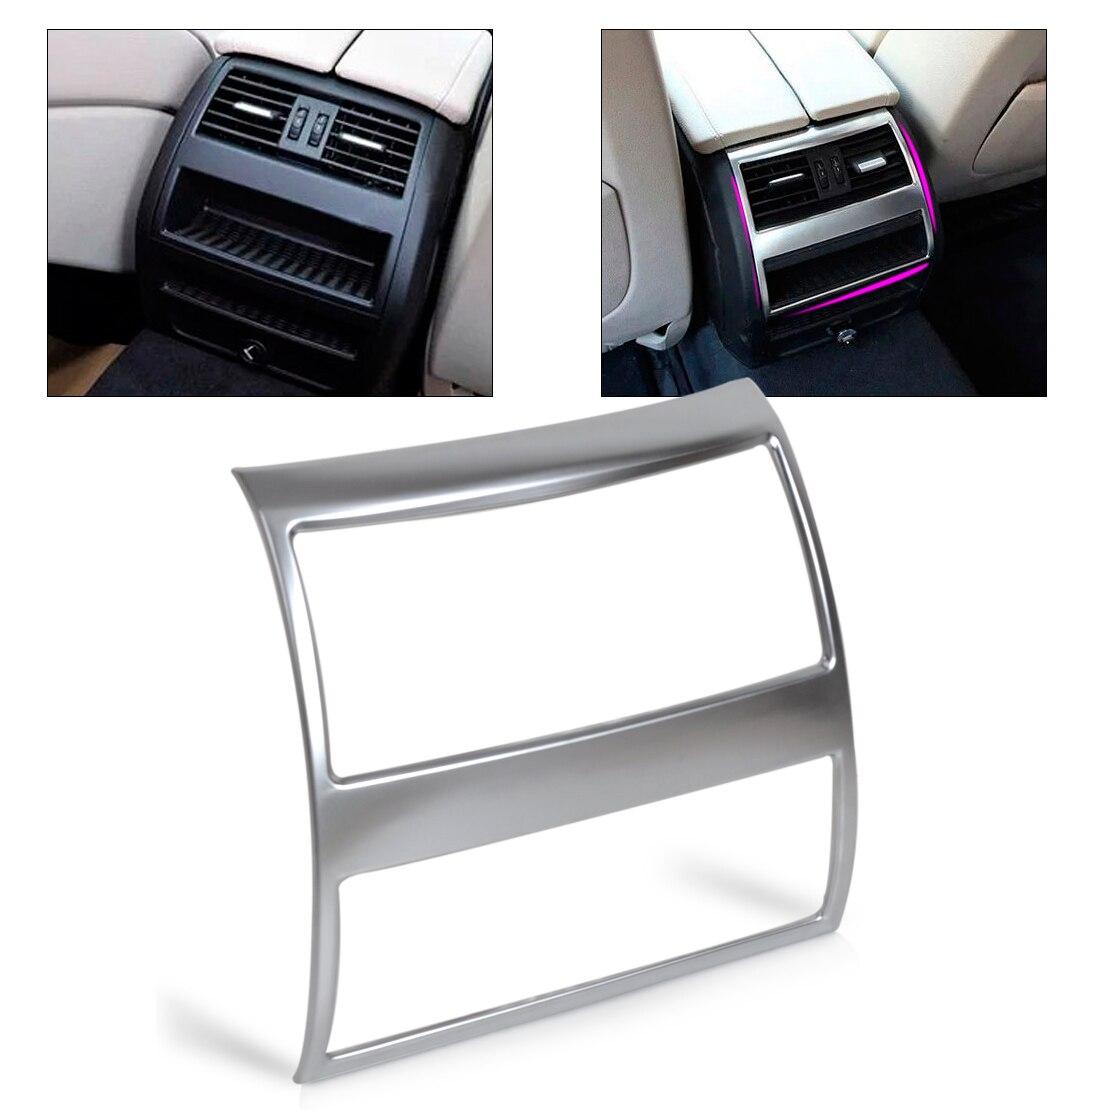 beler Chrome Armrest Box Rear Air Condition Vent Trim Outlet Cover For BMW 5 Series F10 F11 535i 550i 520i 2011 2012 2013 2014